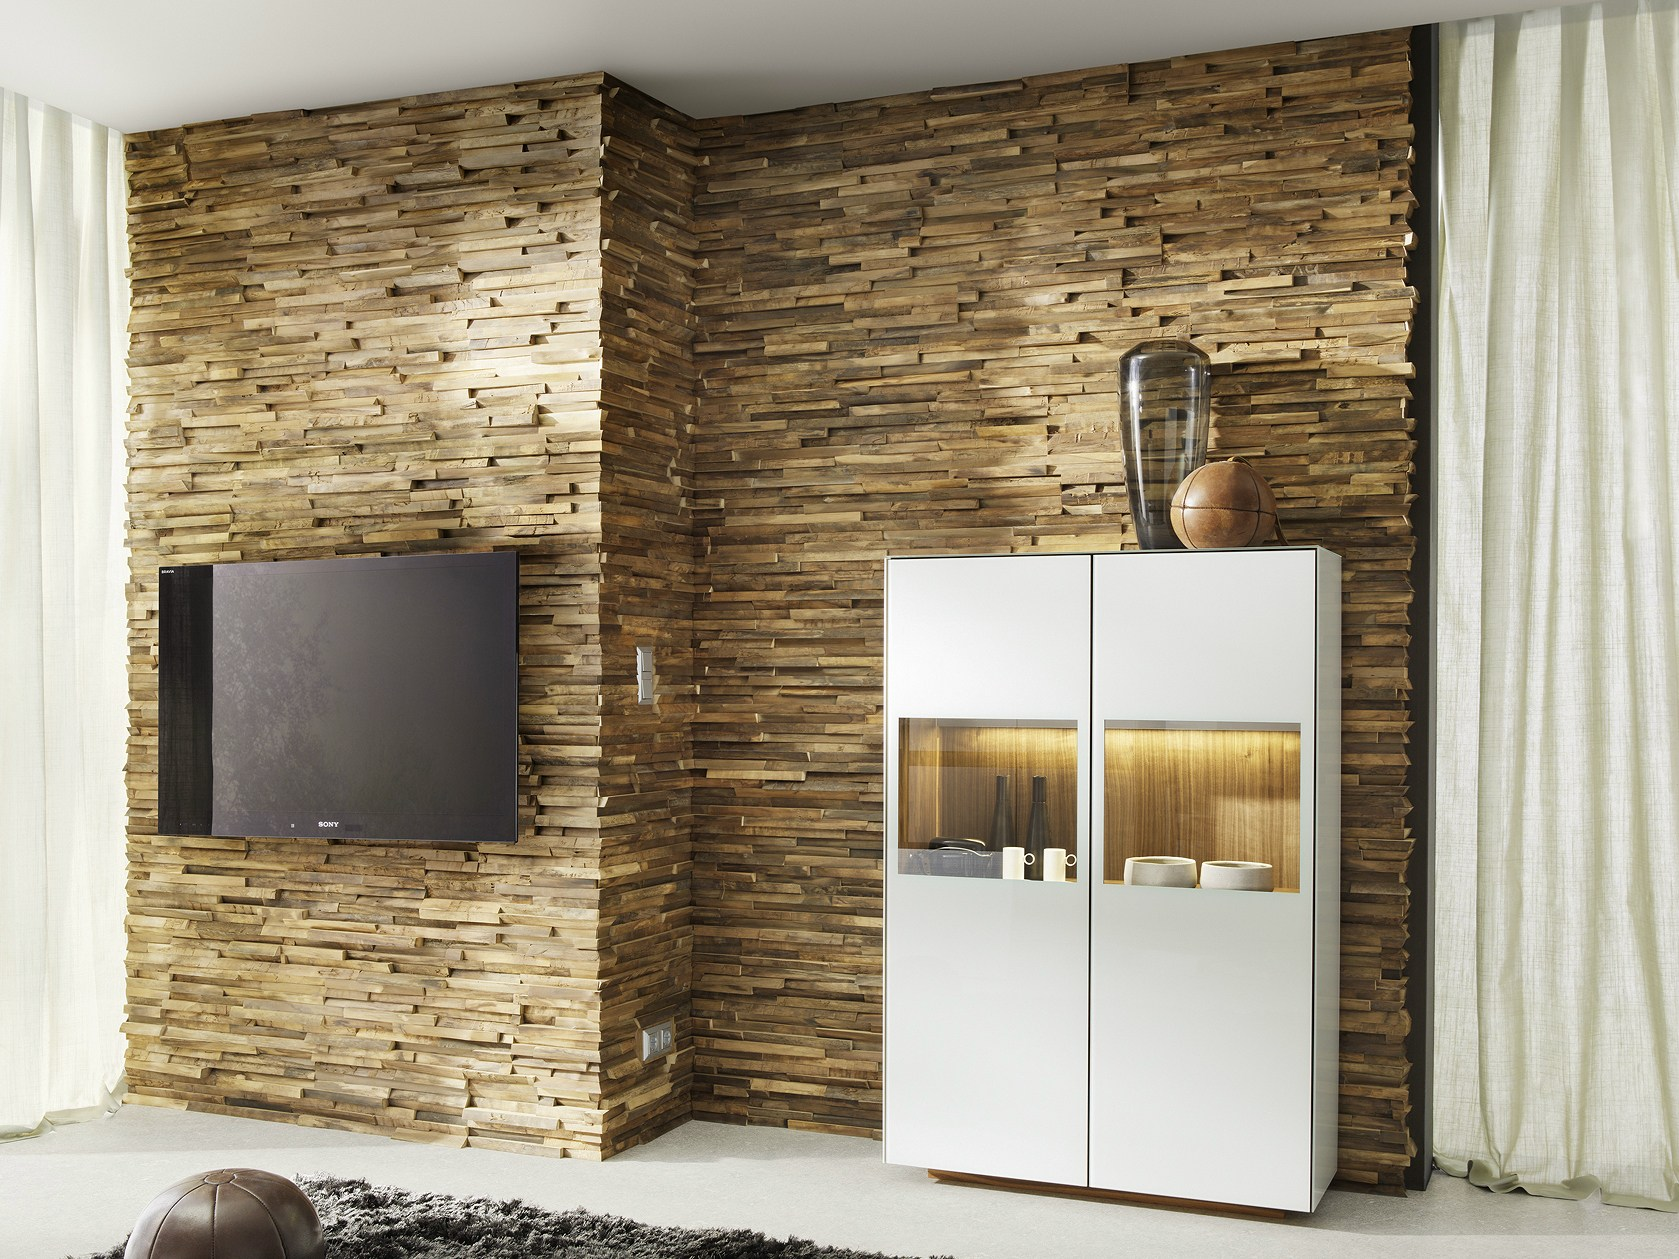 Revestimiento de pared 3d de madera maciza para interiores - Revestimiento paredes interiores ...